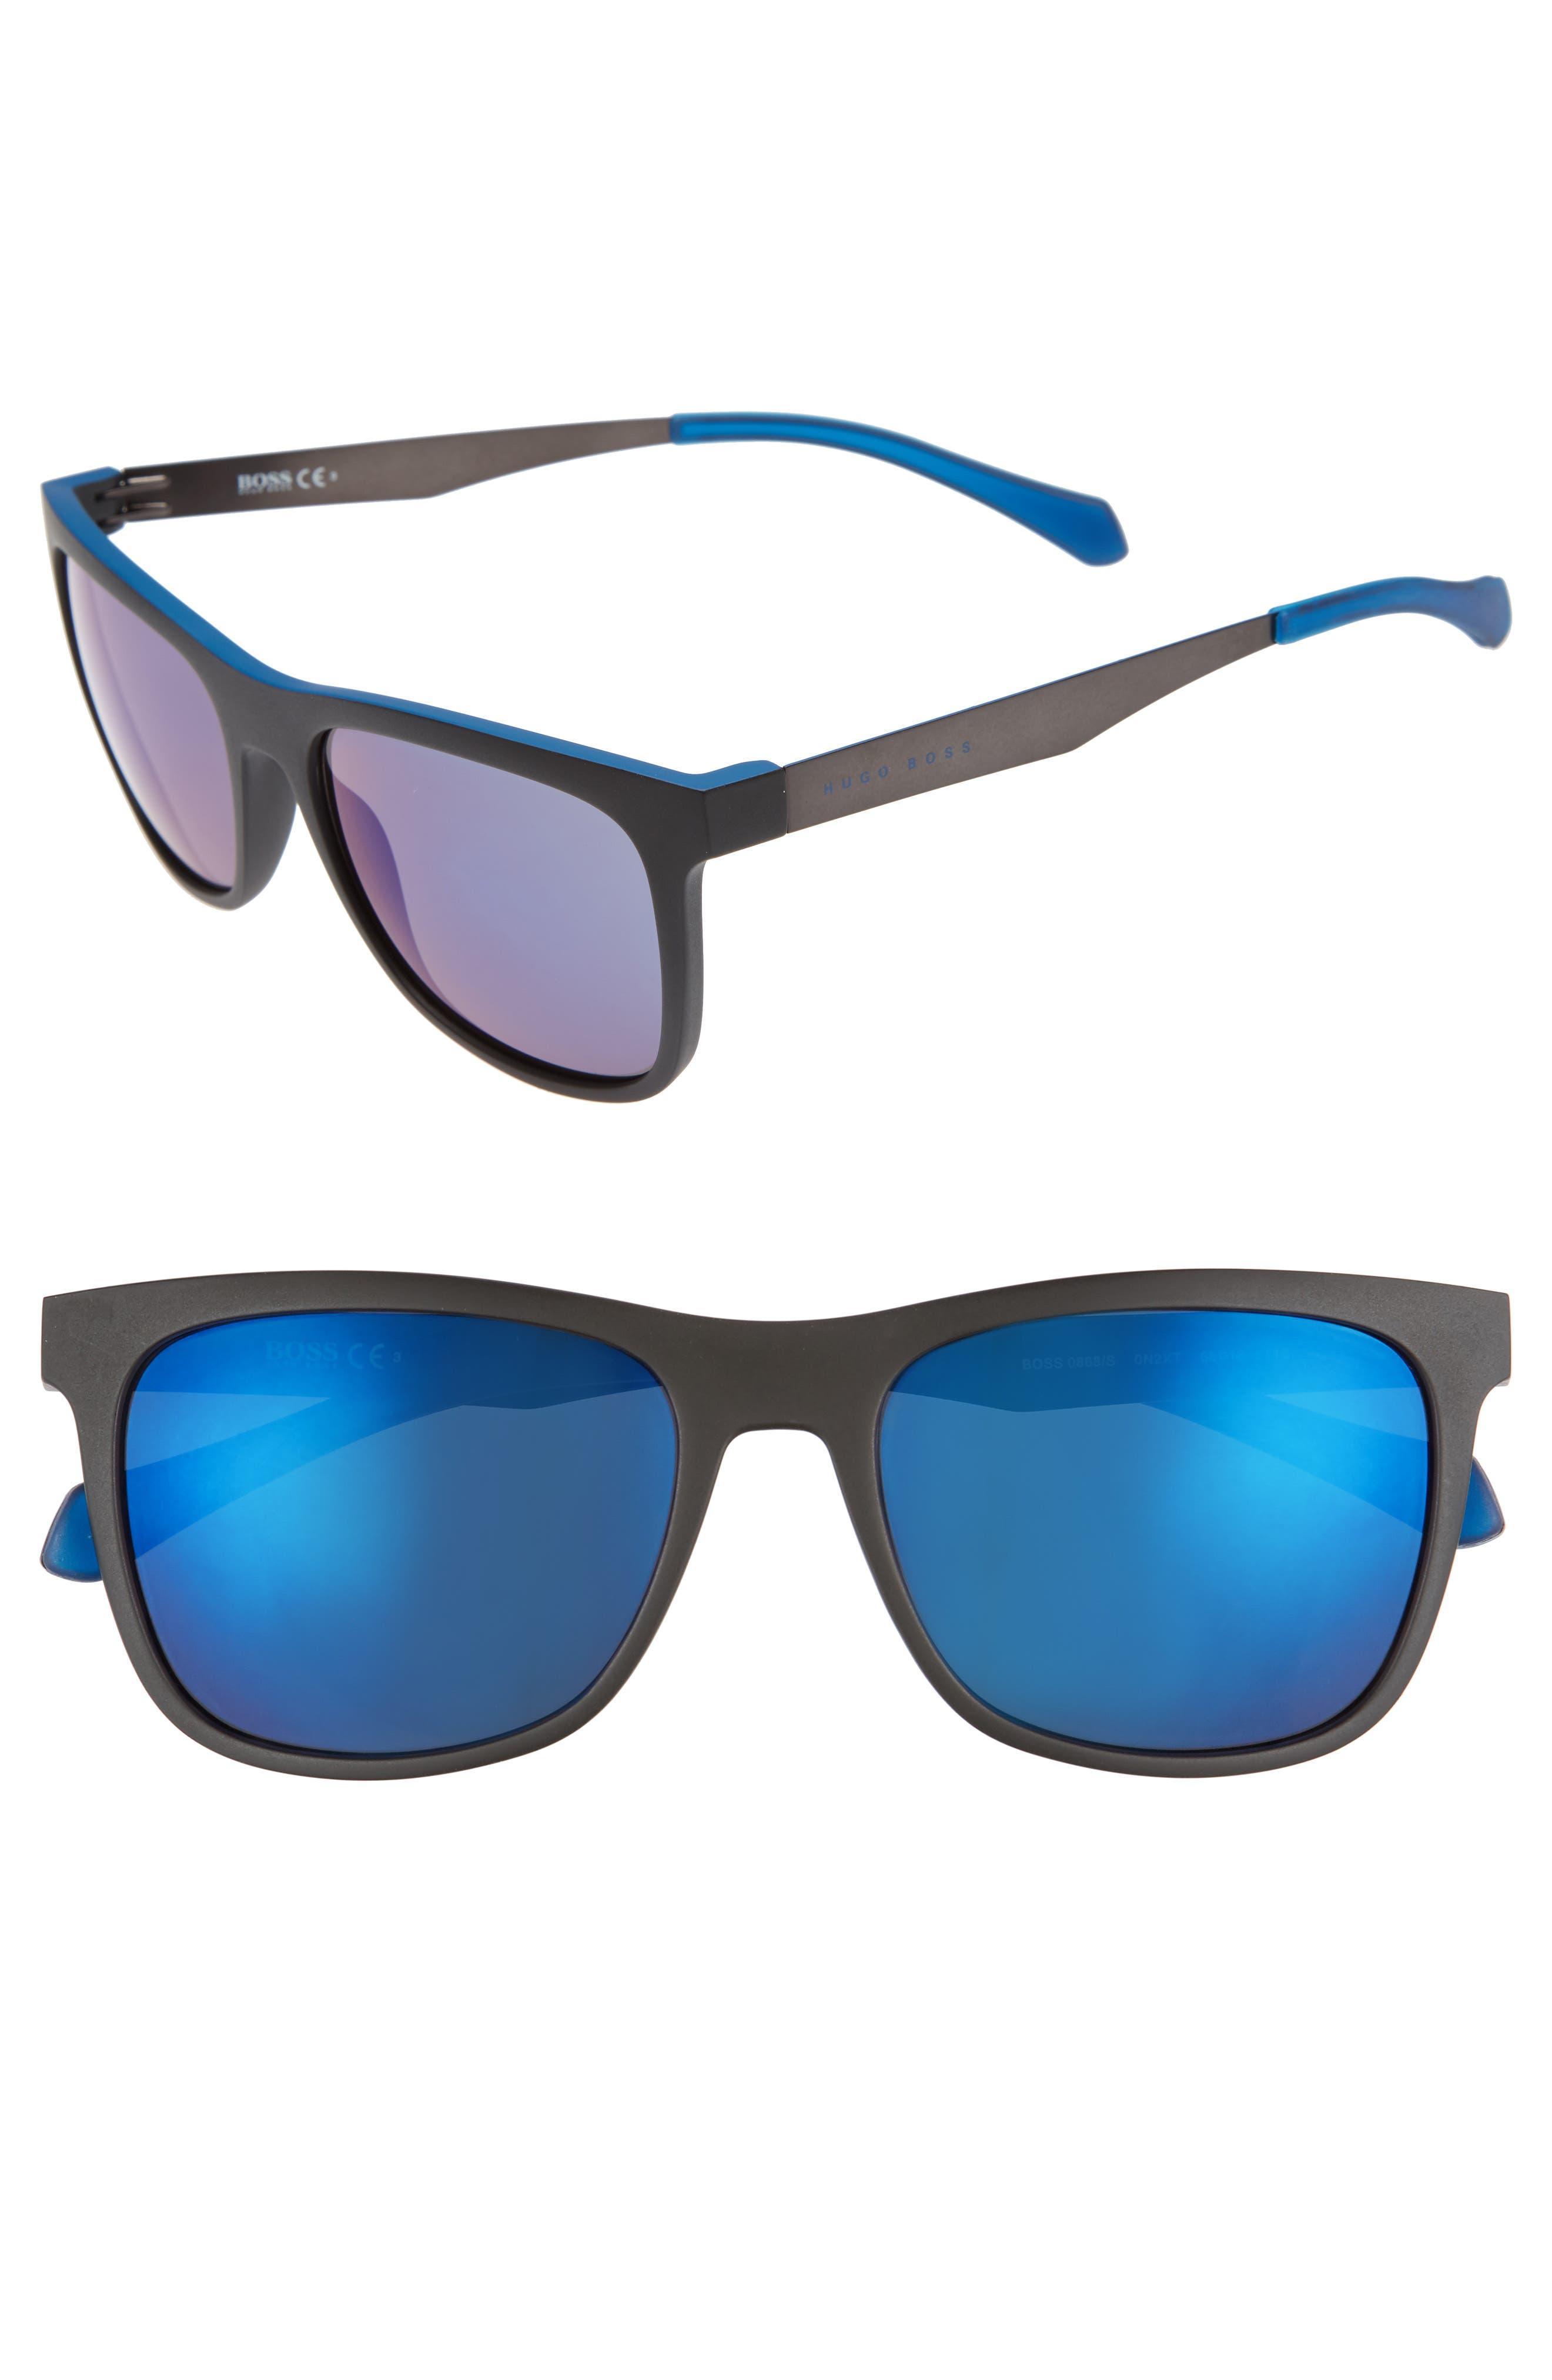 Alternate Image 1 Selected - BOSS 55mm Sunglasses